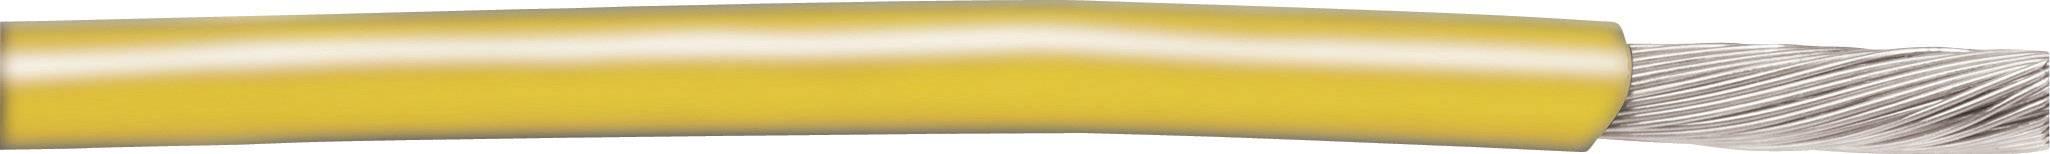 Pletenica EcoWire 1 x 1.31 mm, rumena AlphaWire 6716 30.5 m